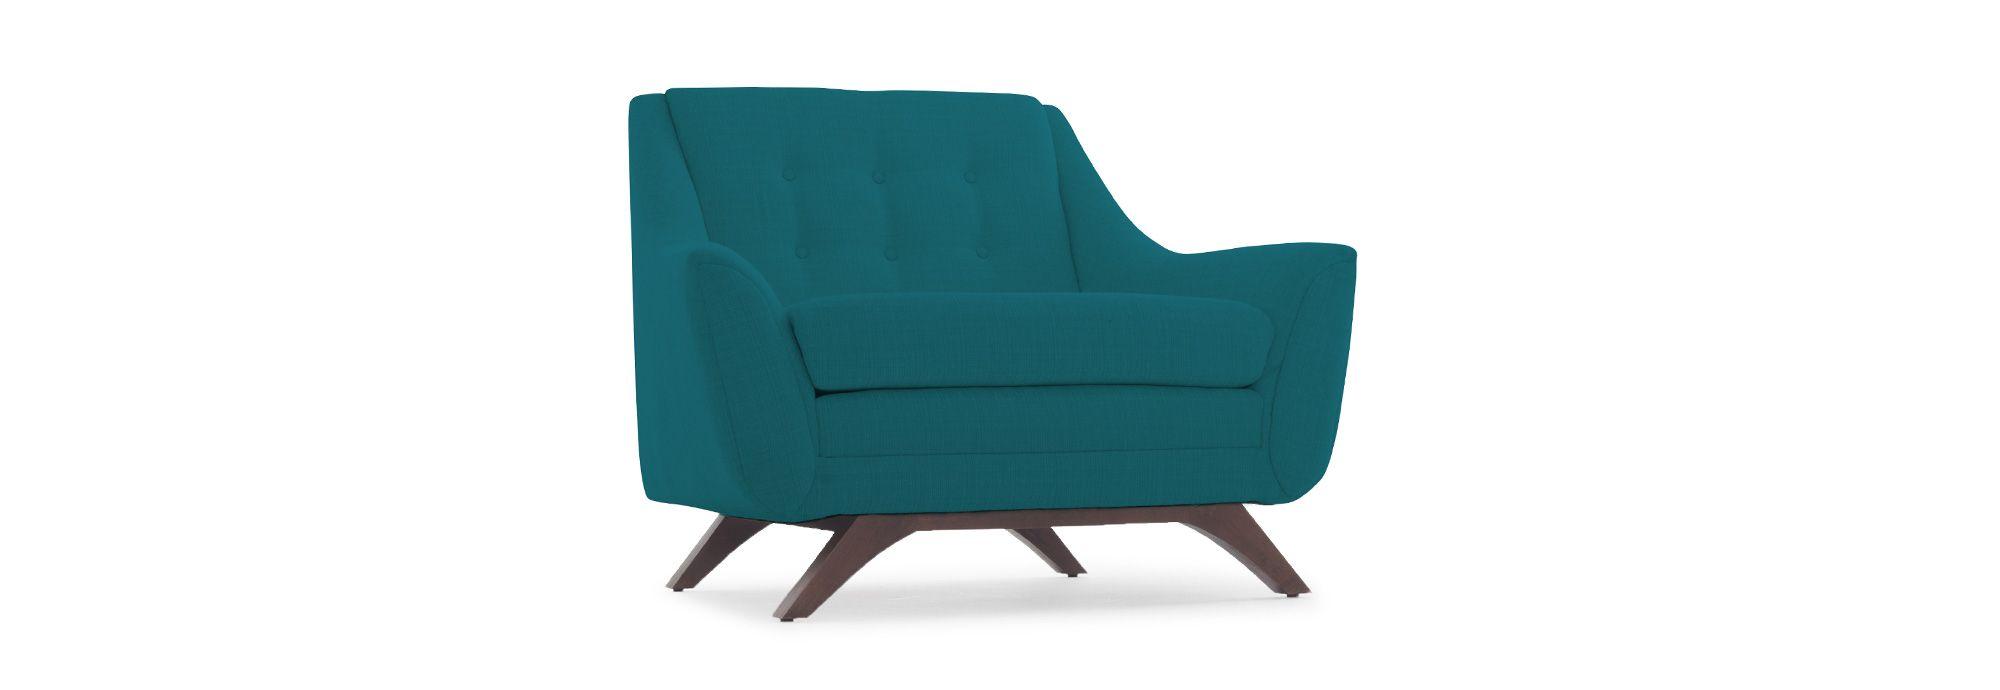 The Ultimate Showpiece Tufted Arm Chair Chair Armchair